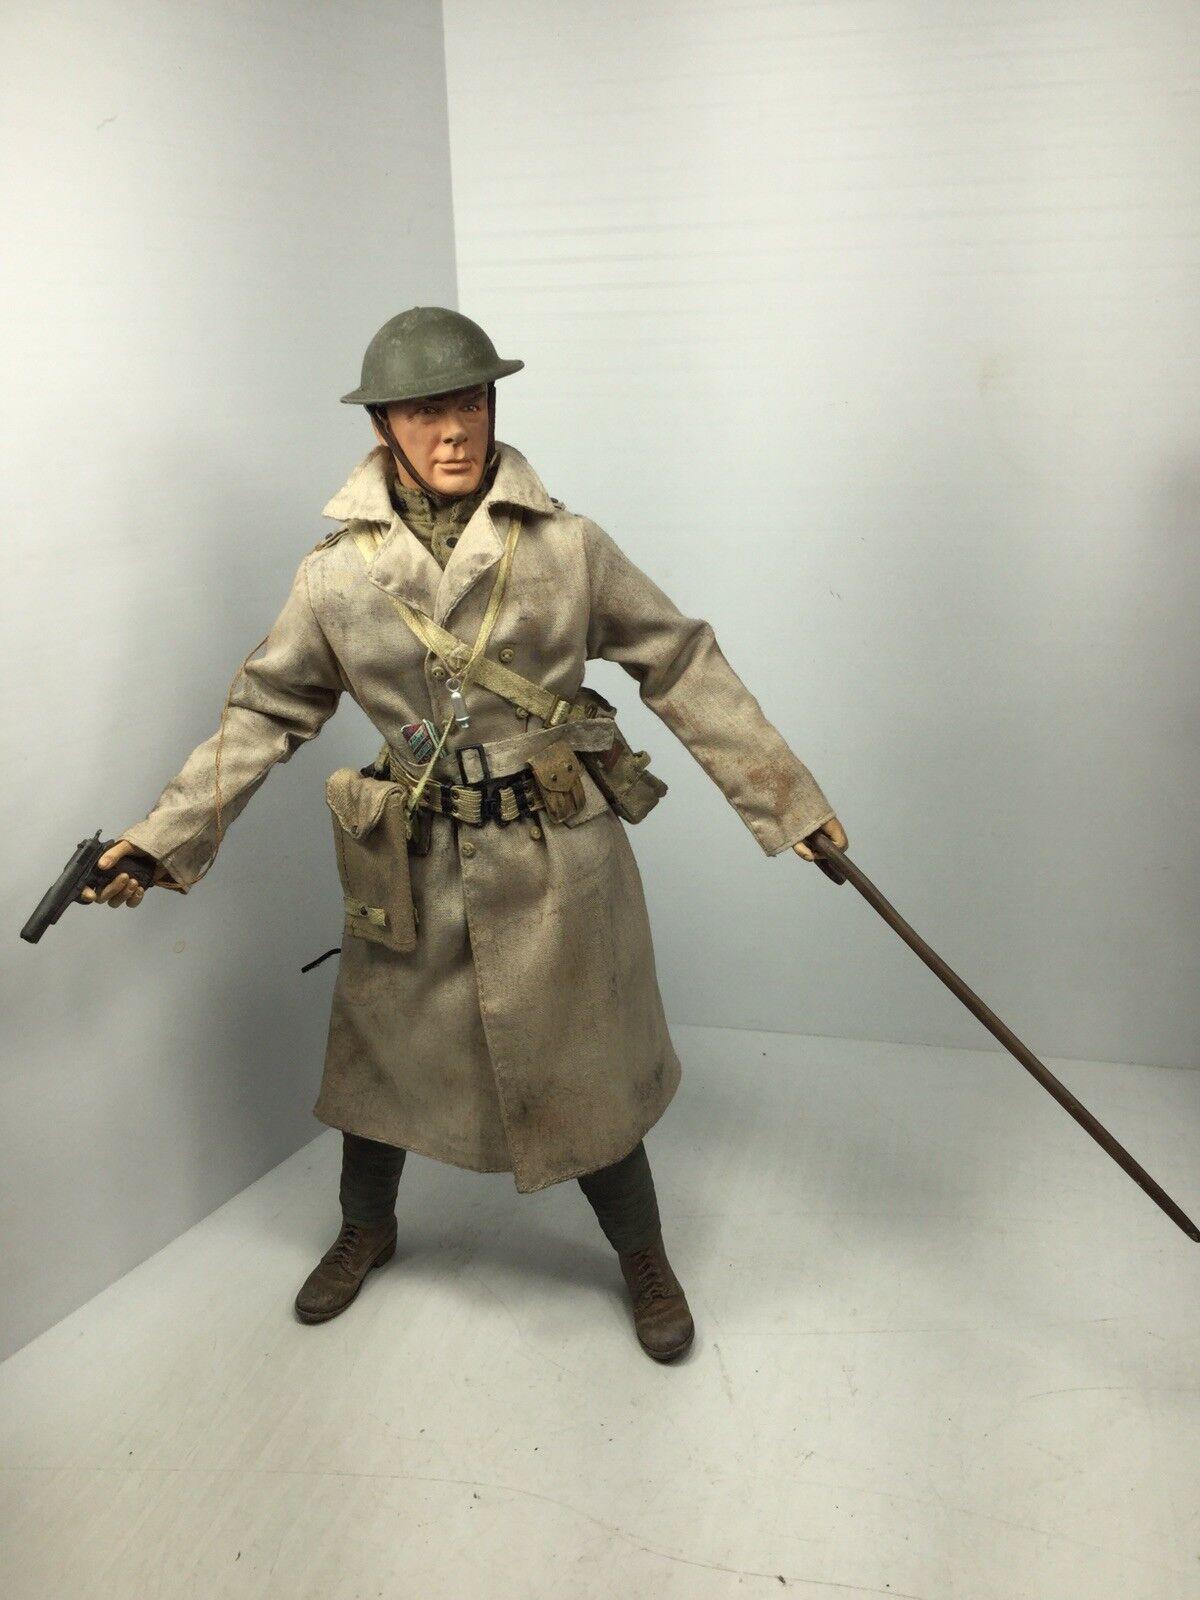 1 6 SIDESHOW WW1 nous A.E.F Lieutenant COLT 1911 + canne & Carte Trench DRAGON ne BBI 21st